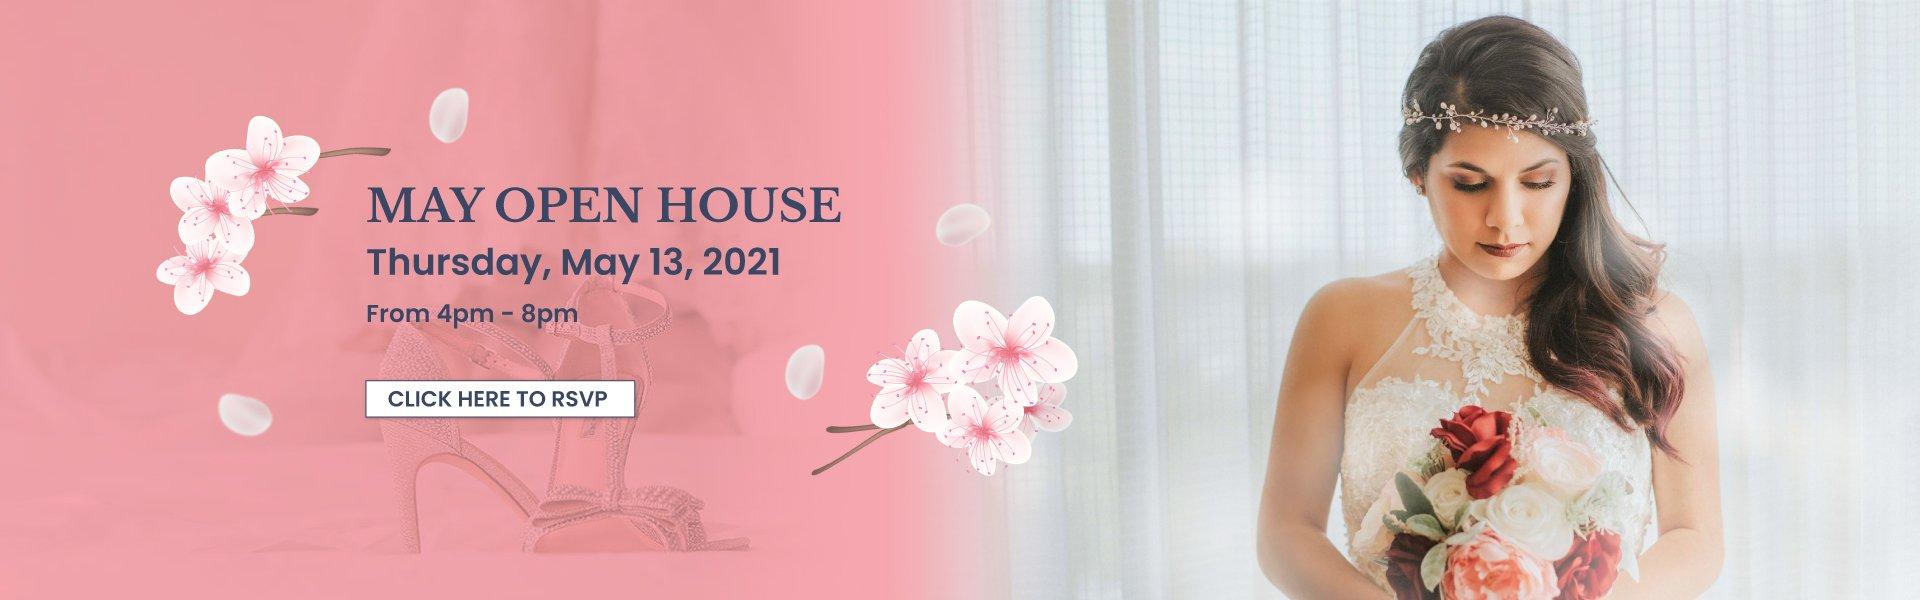 May Open House - Pelazzio